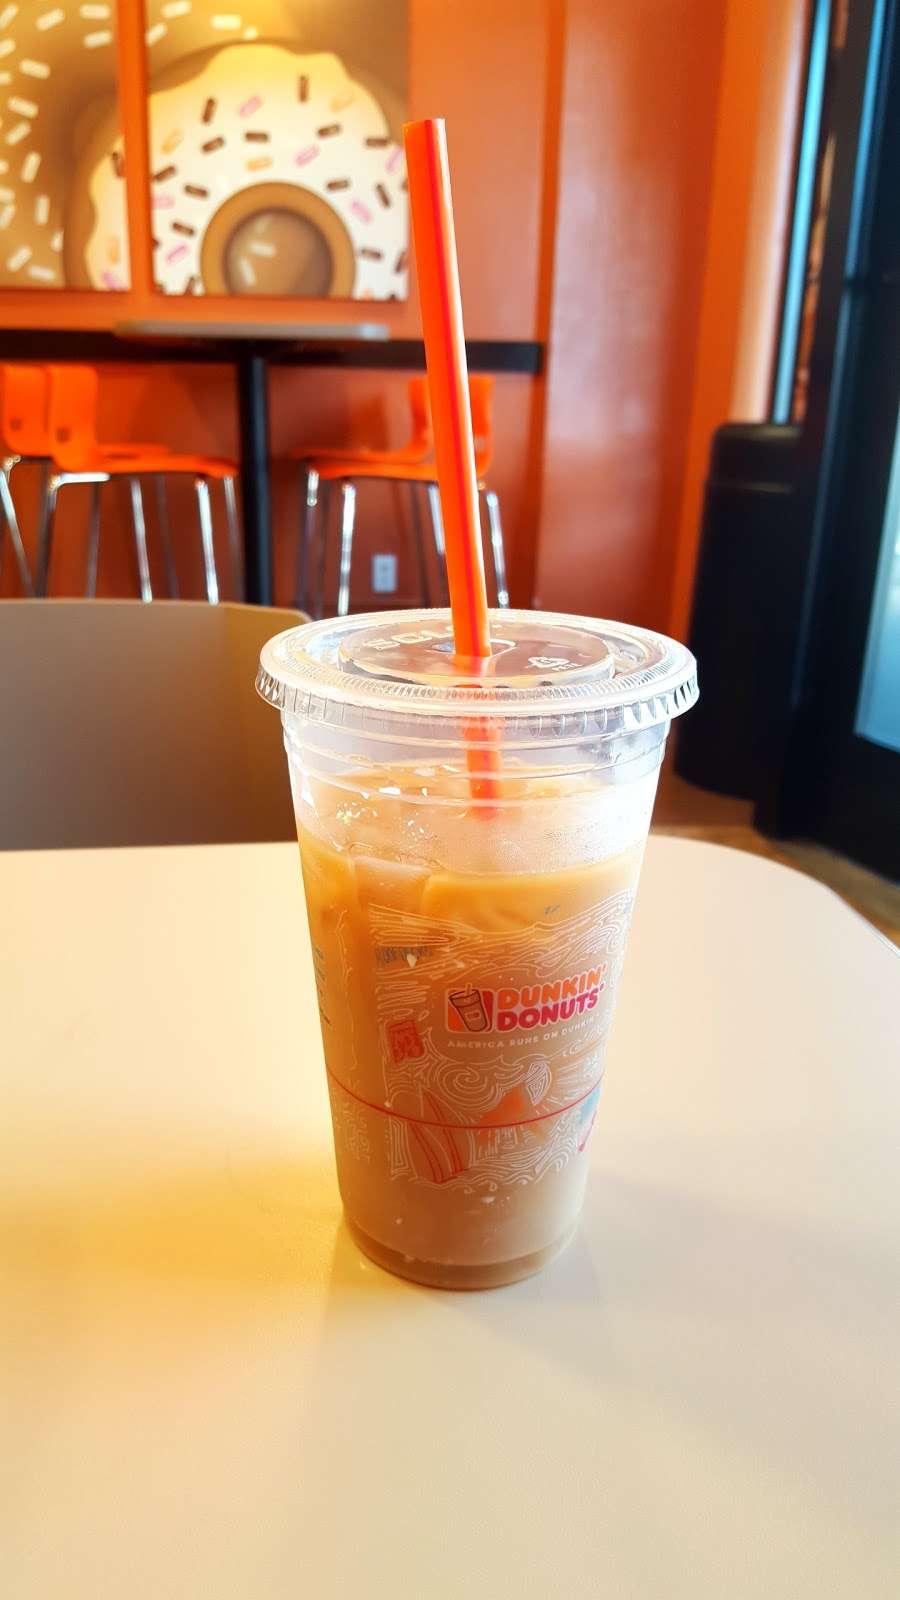 Dunkin Donuts - cafe  | Photo 1 of 10 | Address: 122-17 Liberty Ave, South Richmond Hill, NY 11419, USA | Phone: (718) 848-4874